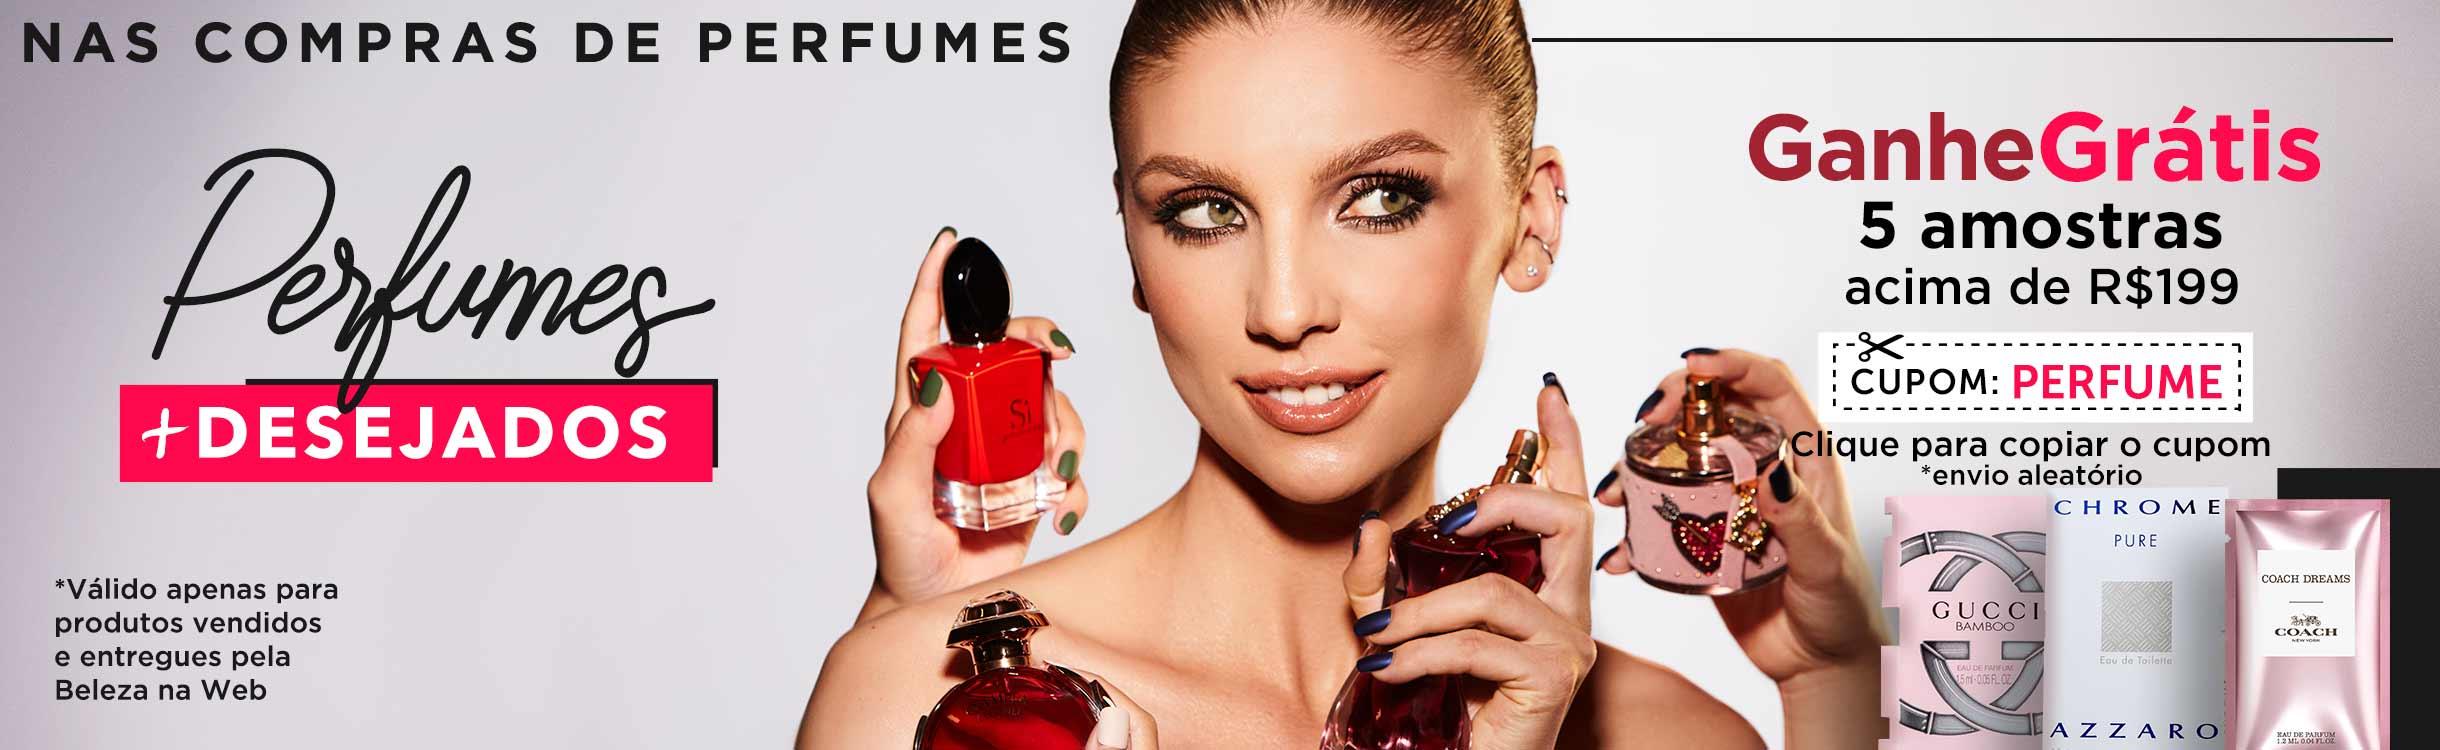 Top Marcas   Perfumes